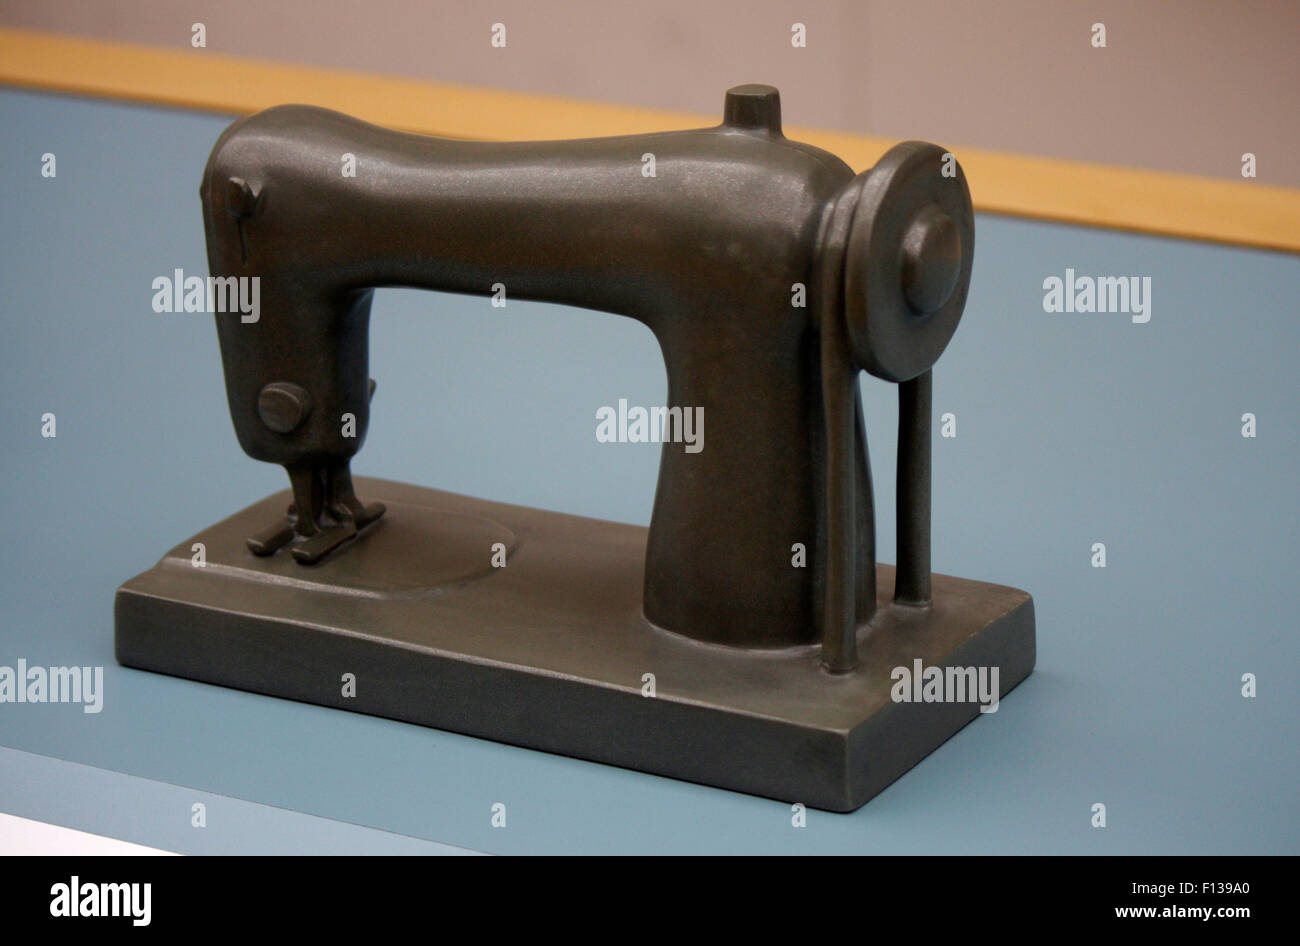 Modell einer Naehmaschine - Deutsches Technikmuseum, Berlin-Kreuzberg. Stock Photo